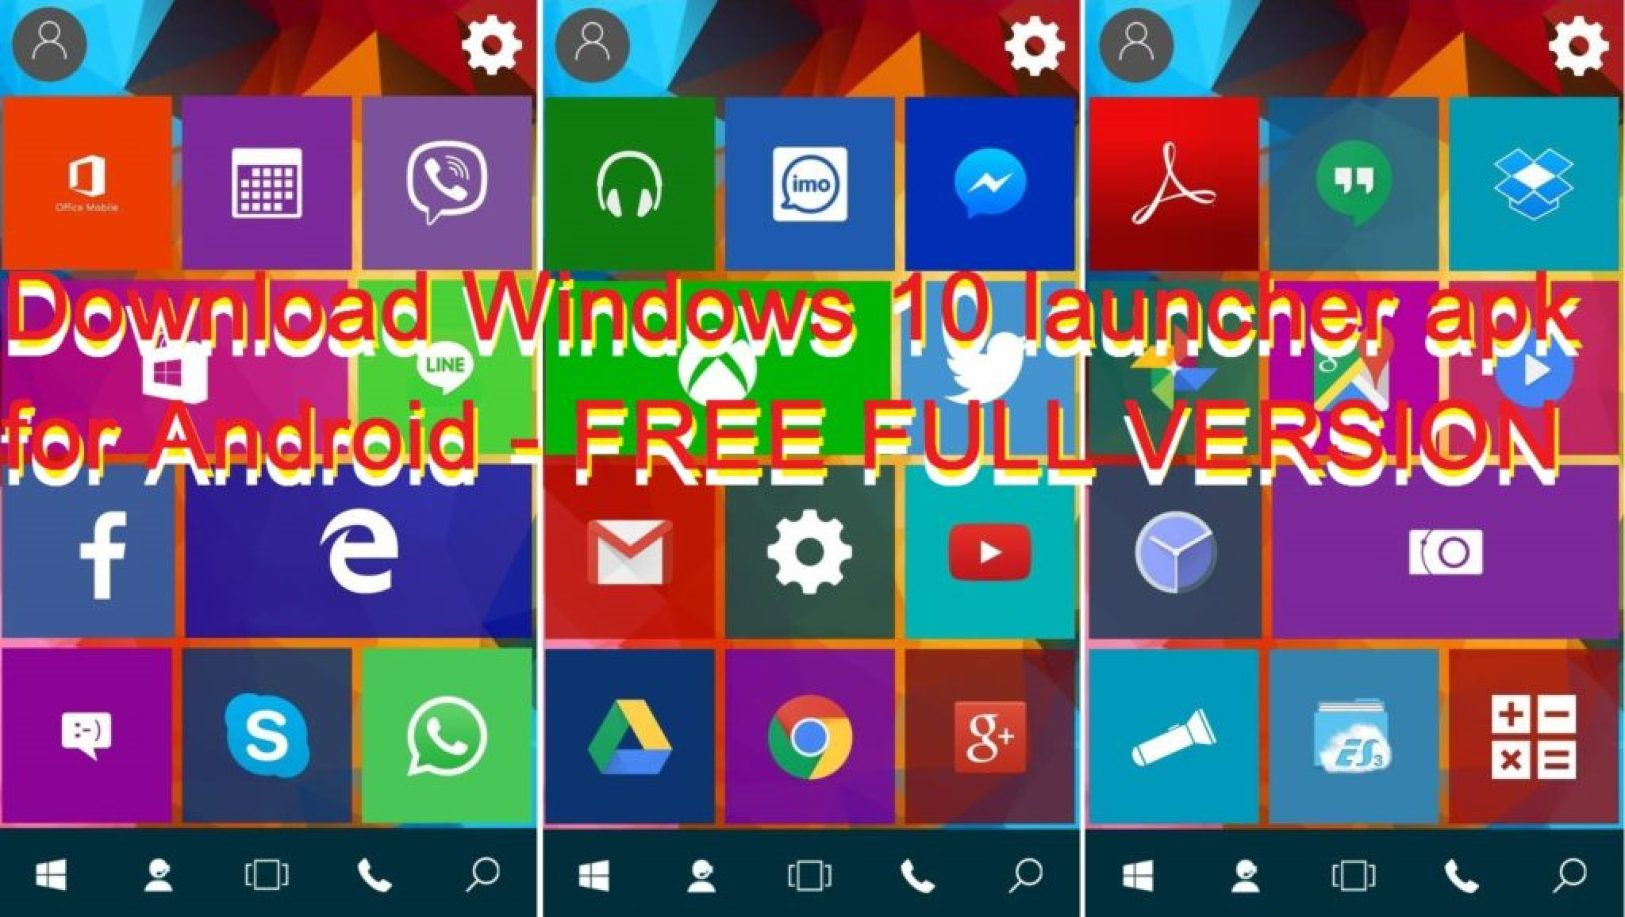 prezi free download for windows 10 full version